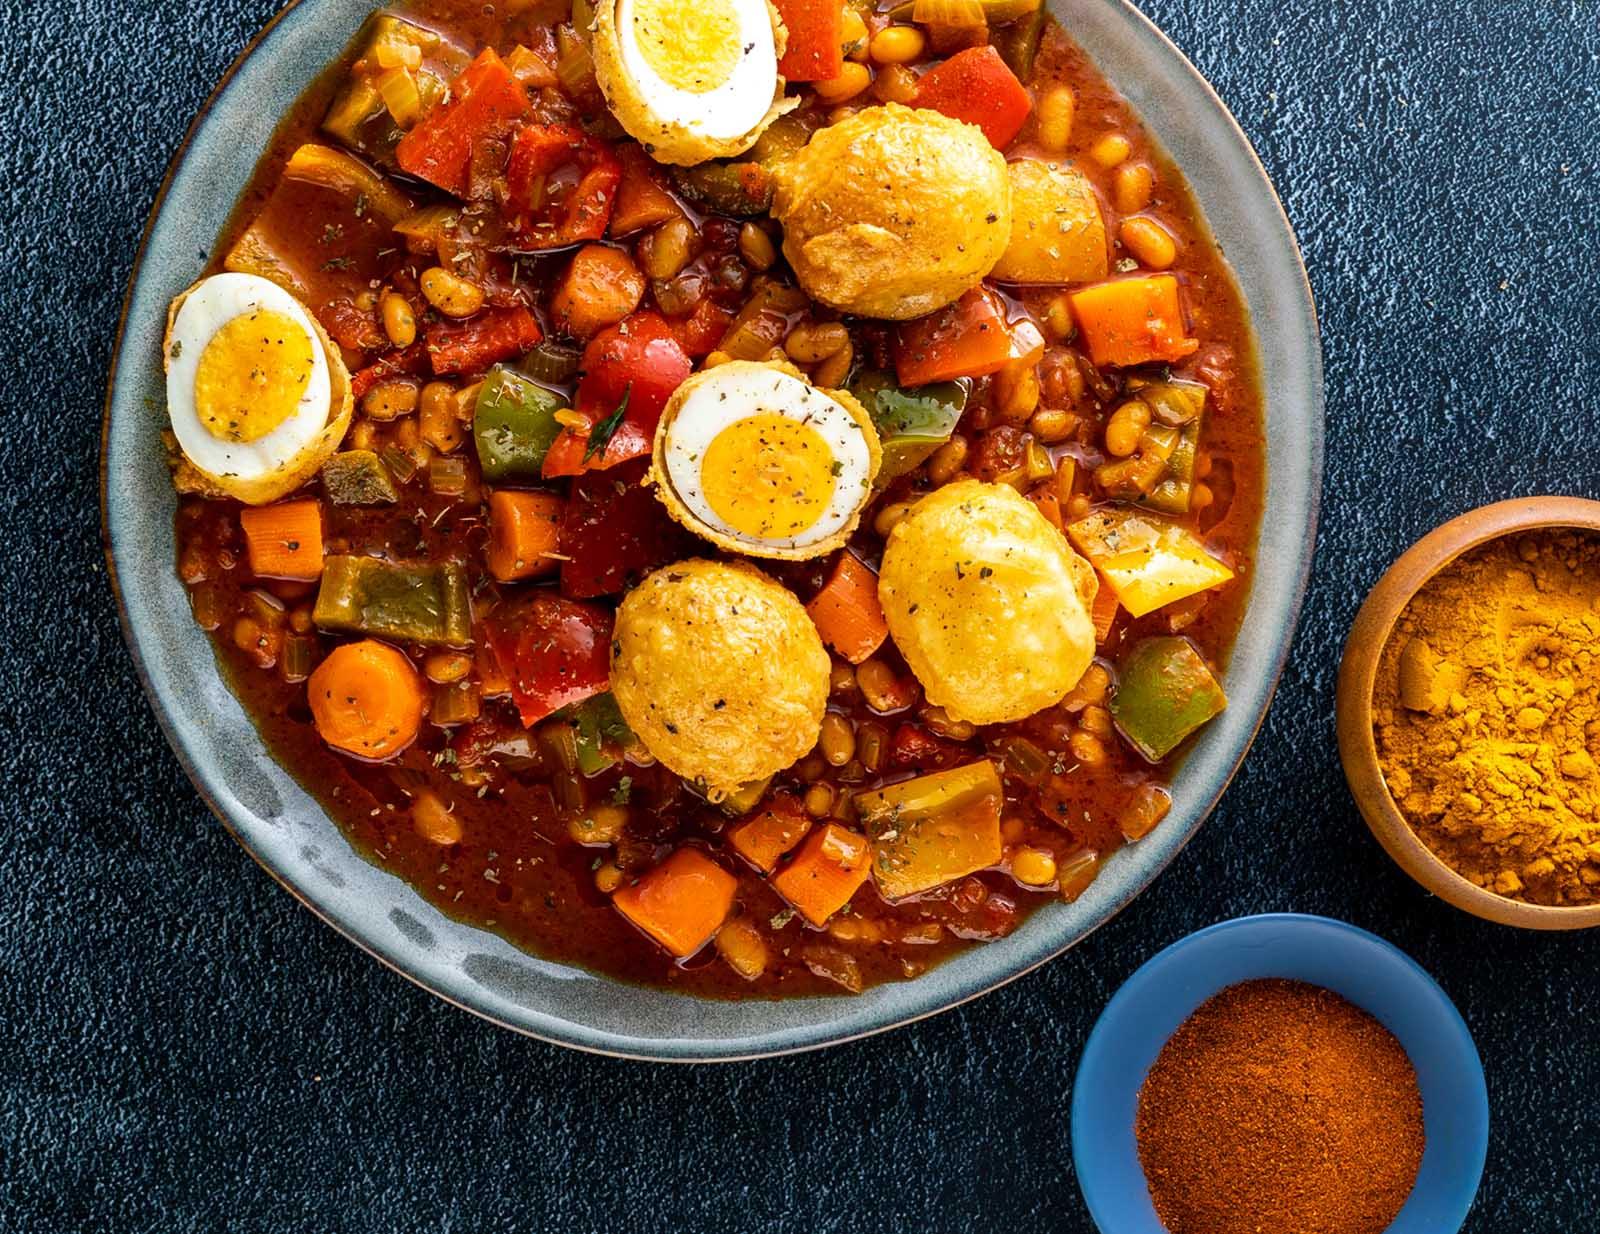 Recipe for Chakalaka and Deep Fried Eggs